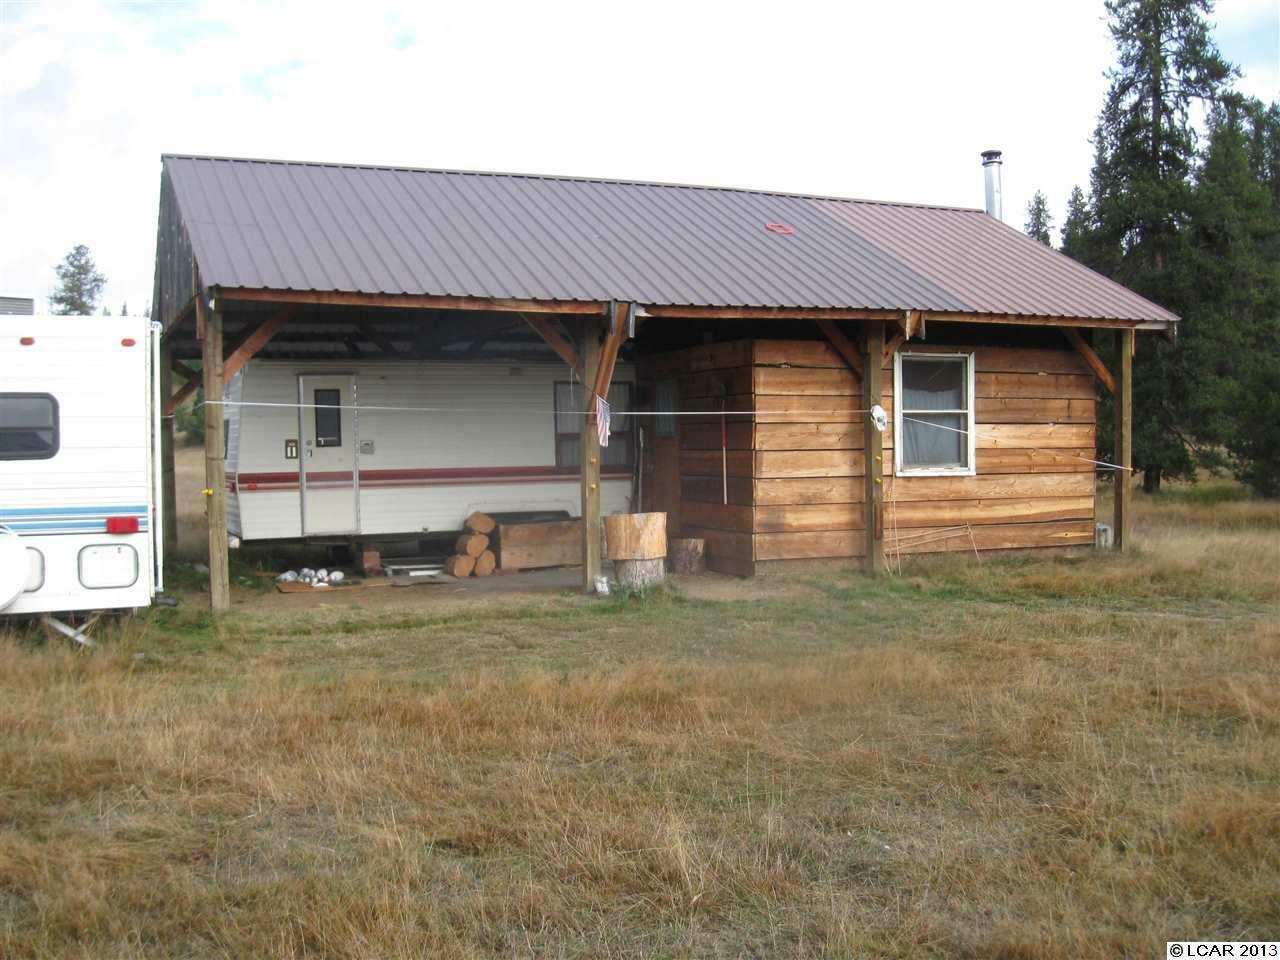 Tbd Elk Creek Rd, Elk City, ID - USA (photo 2)